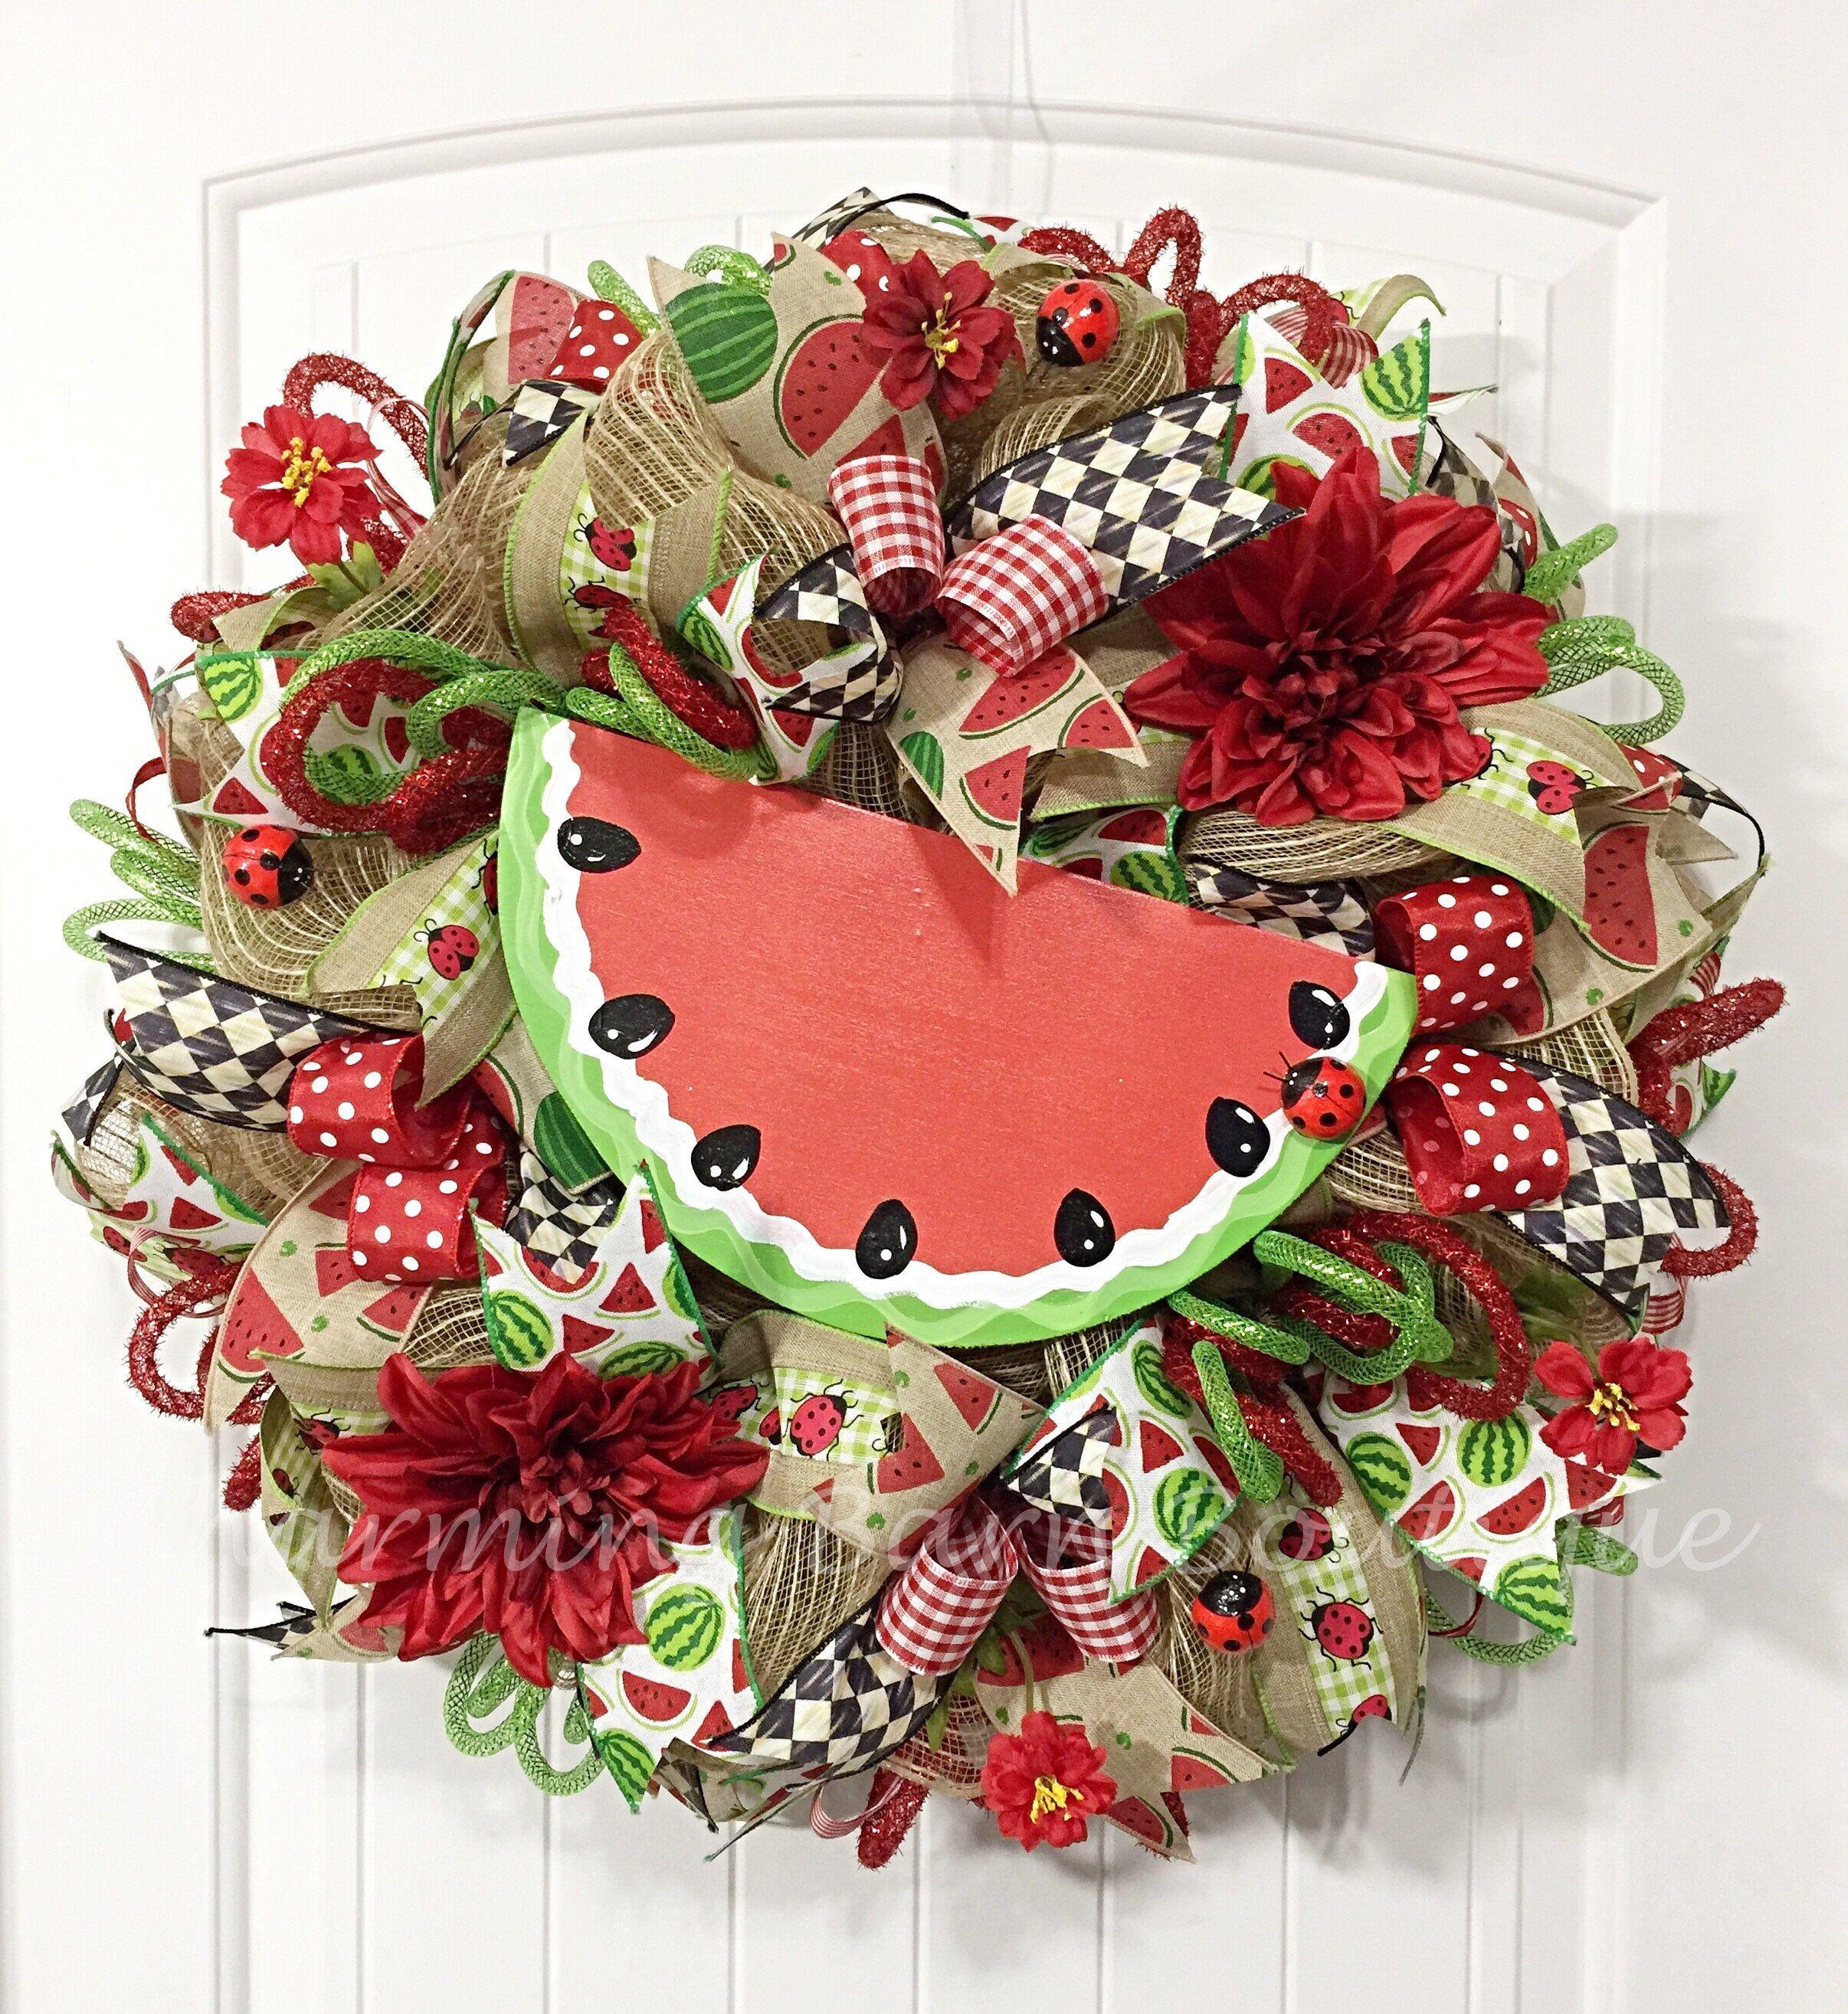 Spring wreath summer wreath welcome wreath watermelon wreath spring wreath summer wreath welcome wreath watermelon wreath front door wreath rubansaba